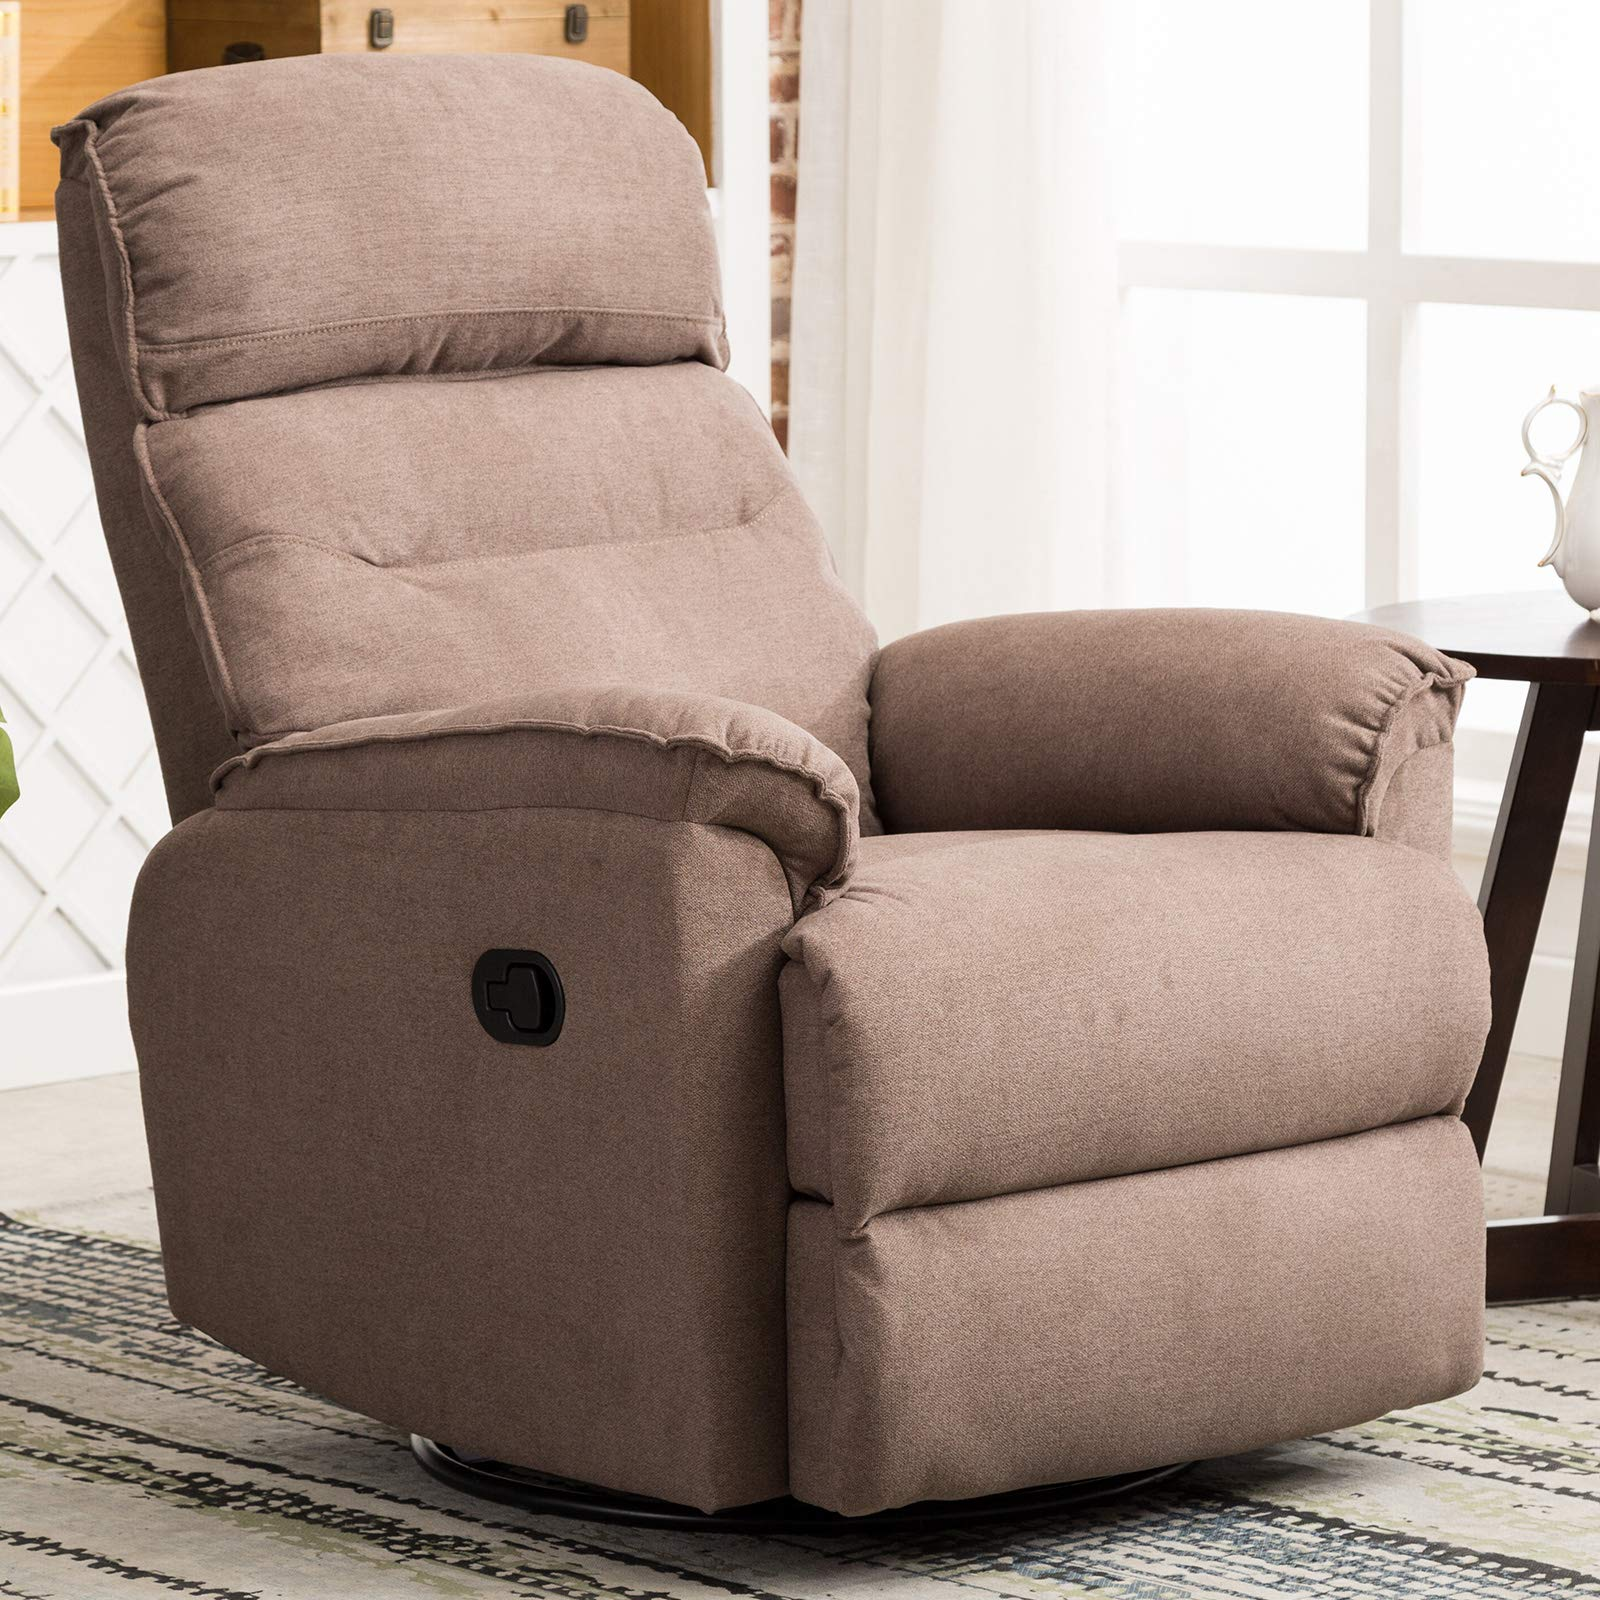 ANJ Swivel Rocker Recliner Chair - Single Modern Sofa Home Theater Seating, Manual Reclining Chair for Living Room, Smoke Gray by ANJ